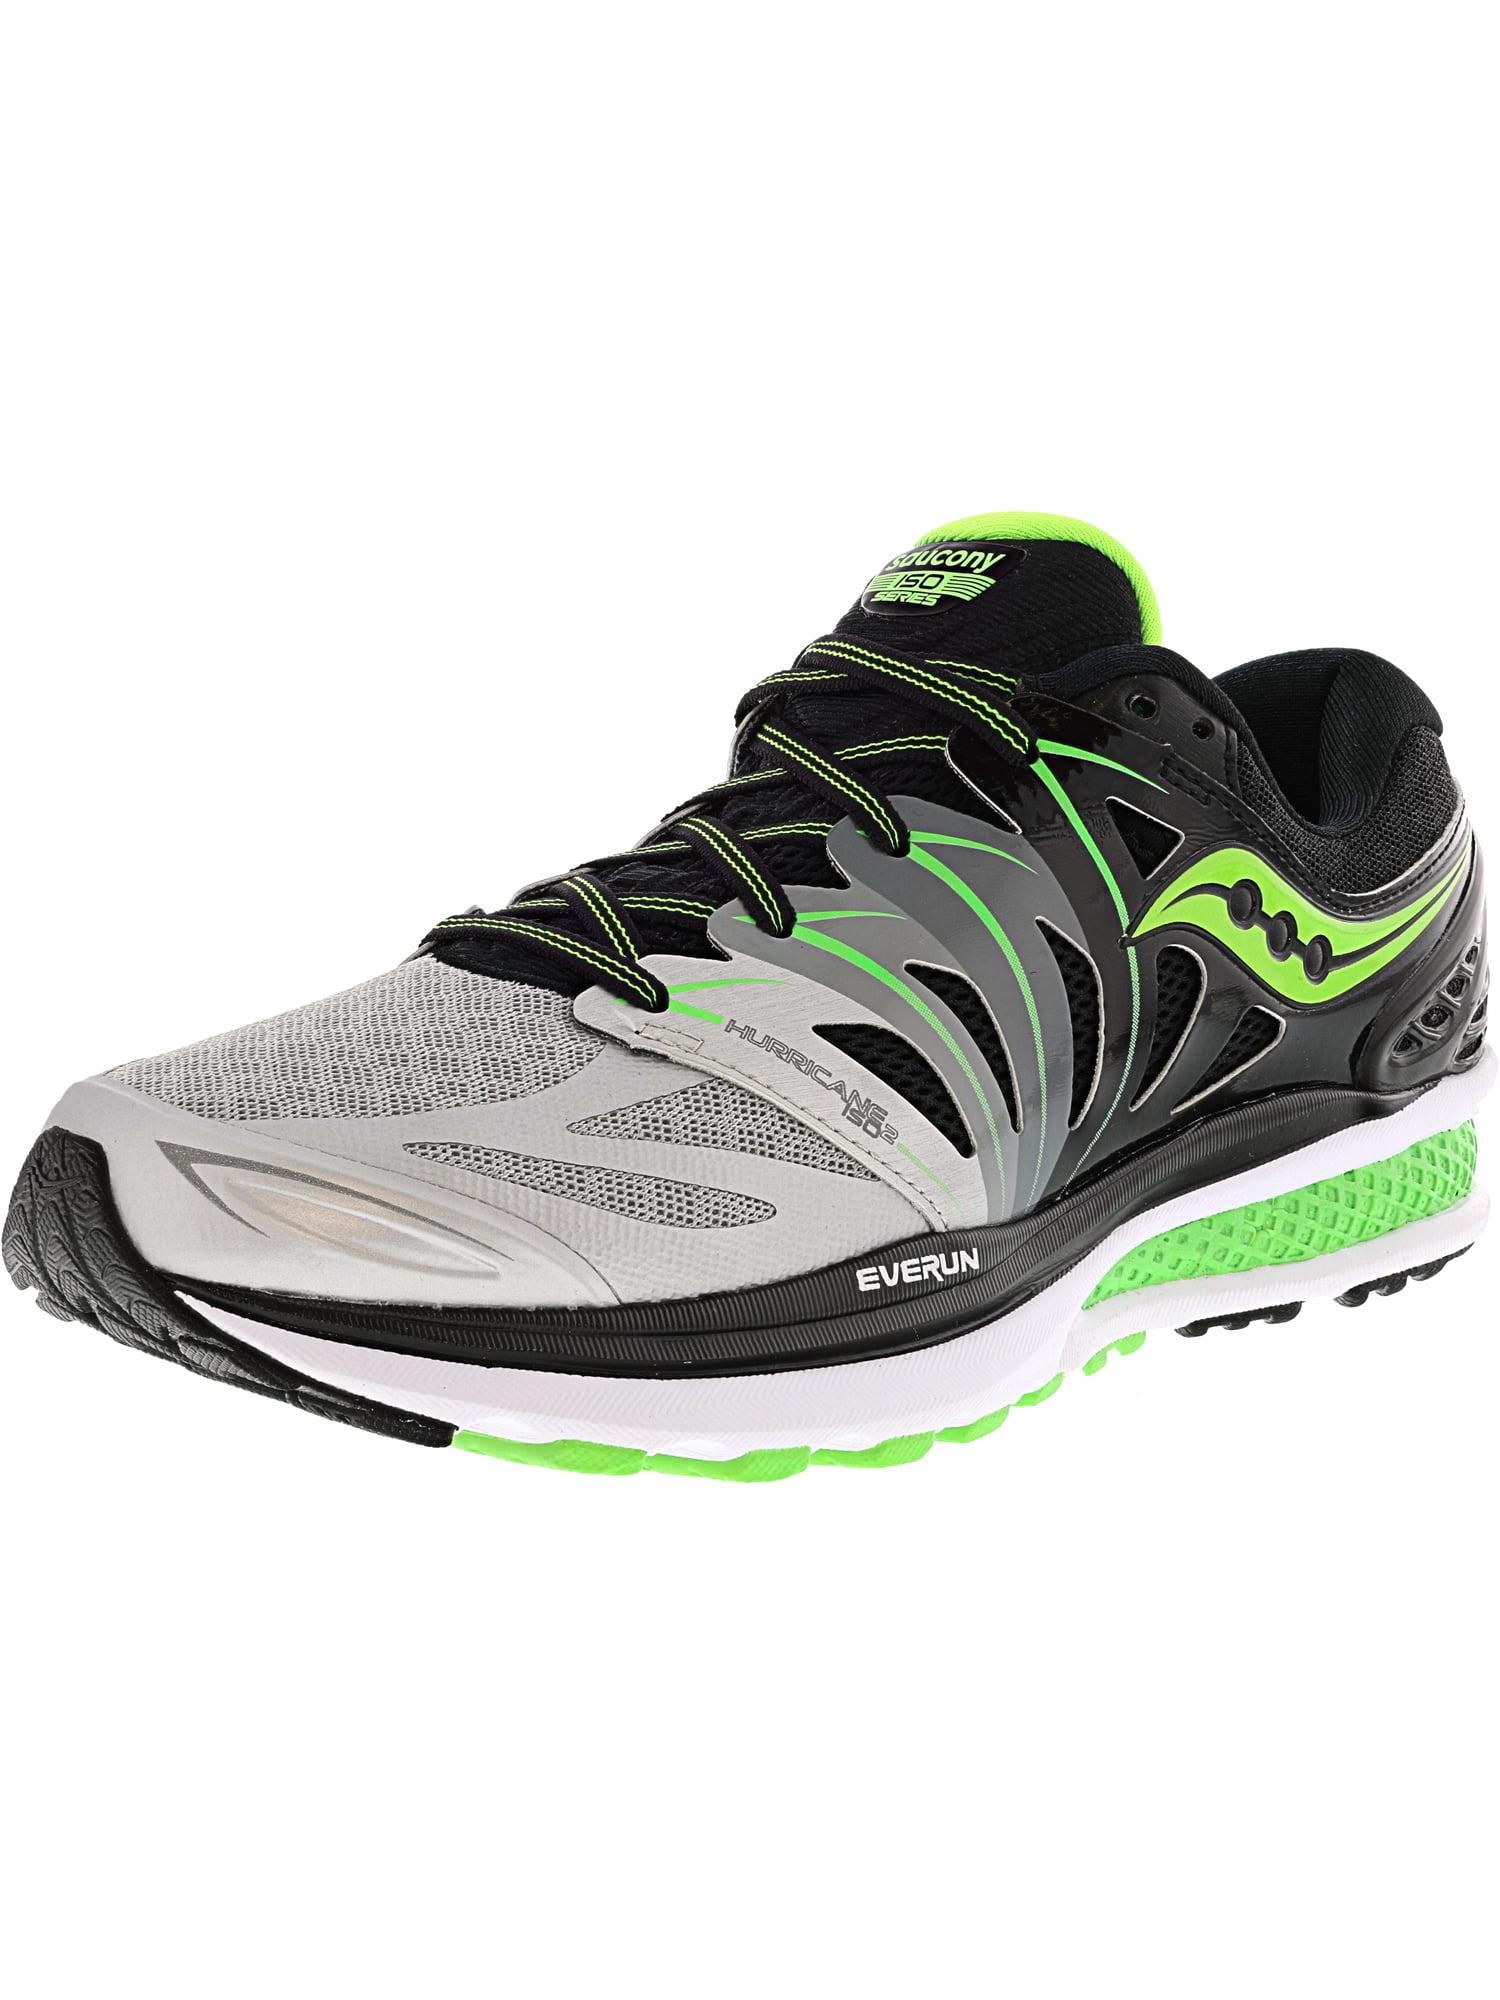 Saucony Men's Hurricane Iso 2 Black / Silver Slime Ankle-High Running Shoe - 8W